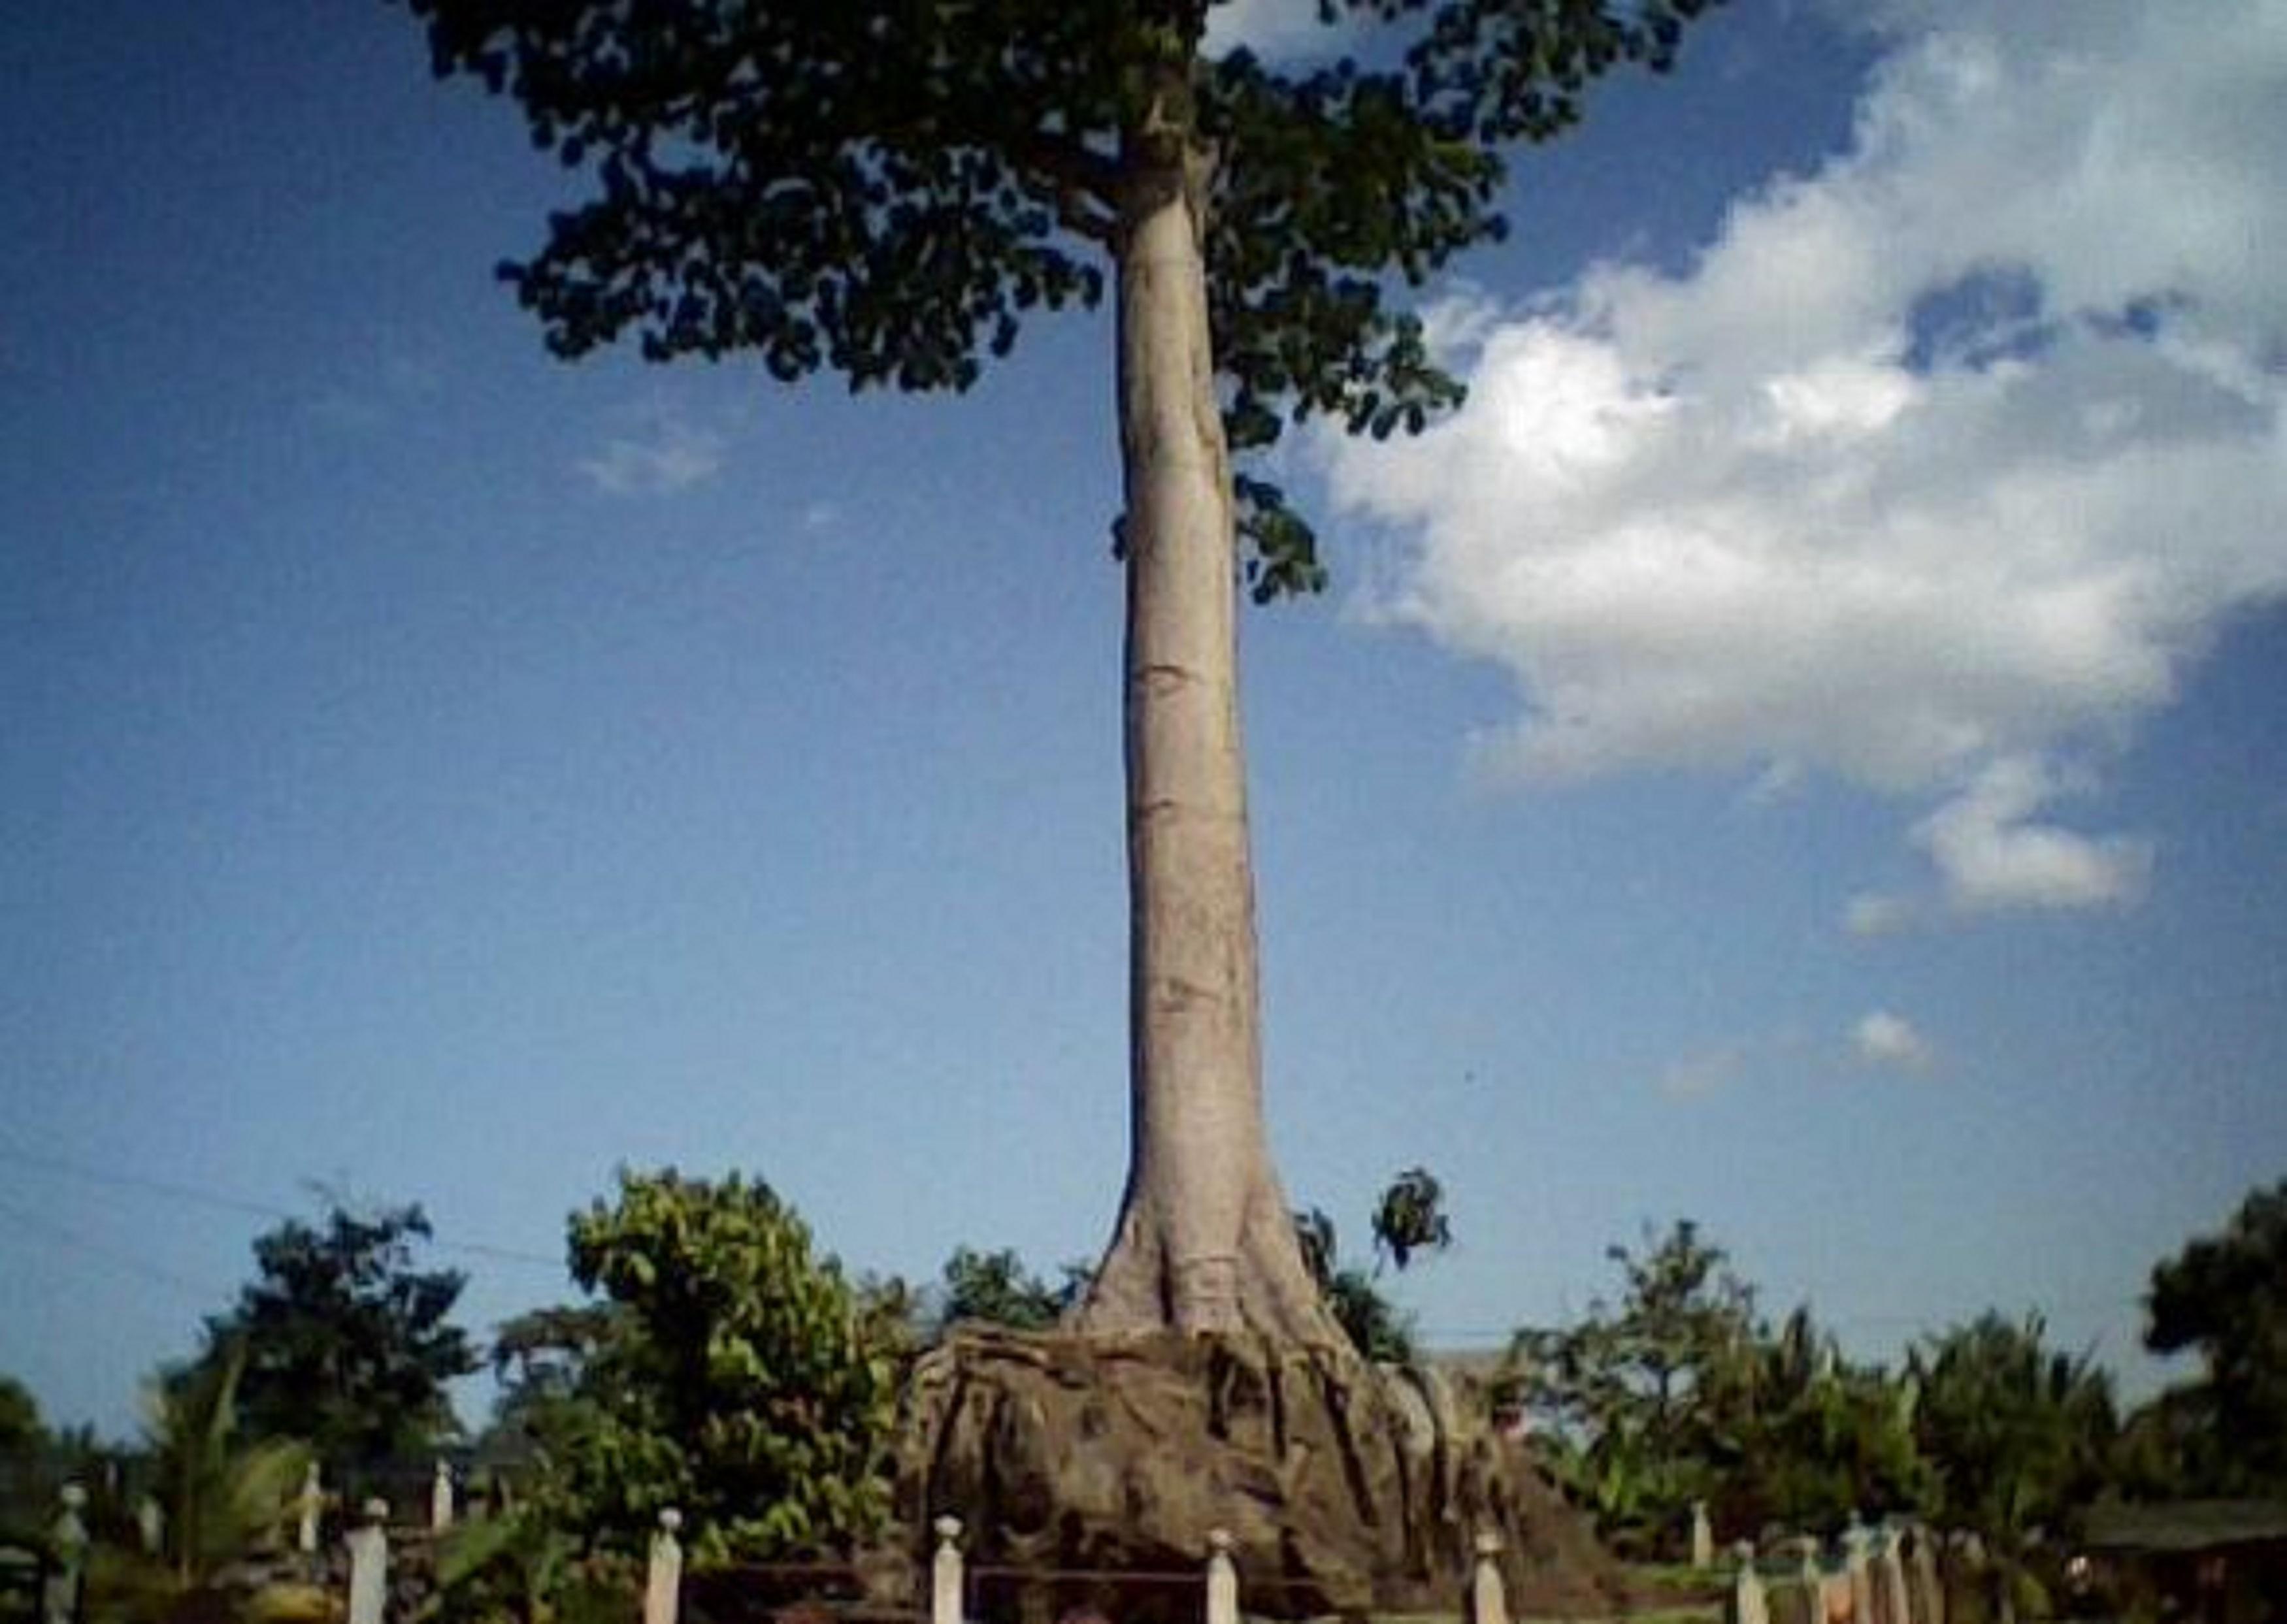 Baobab on a rock